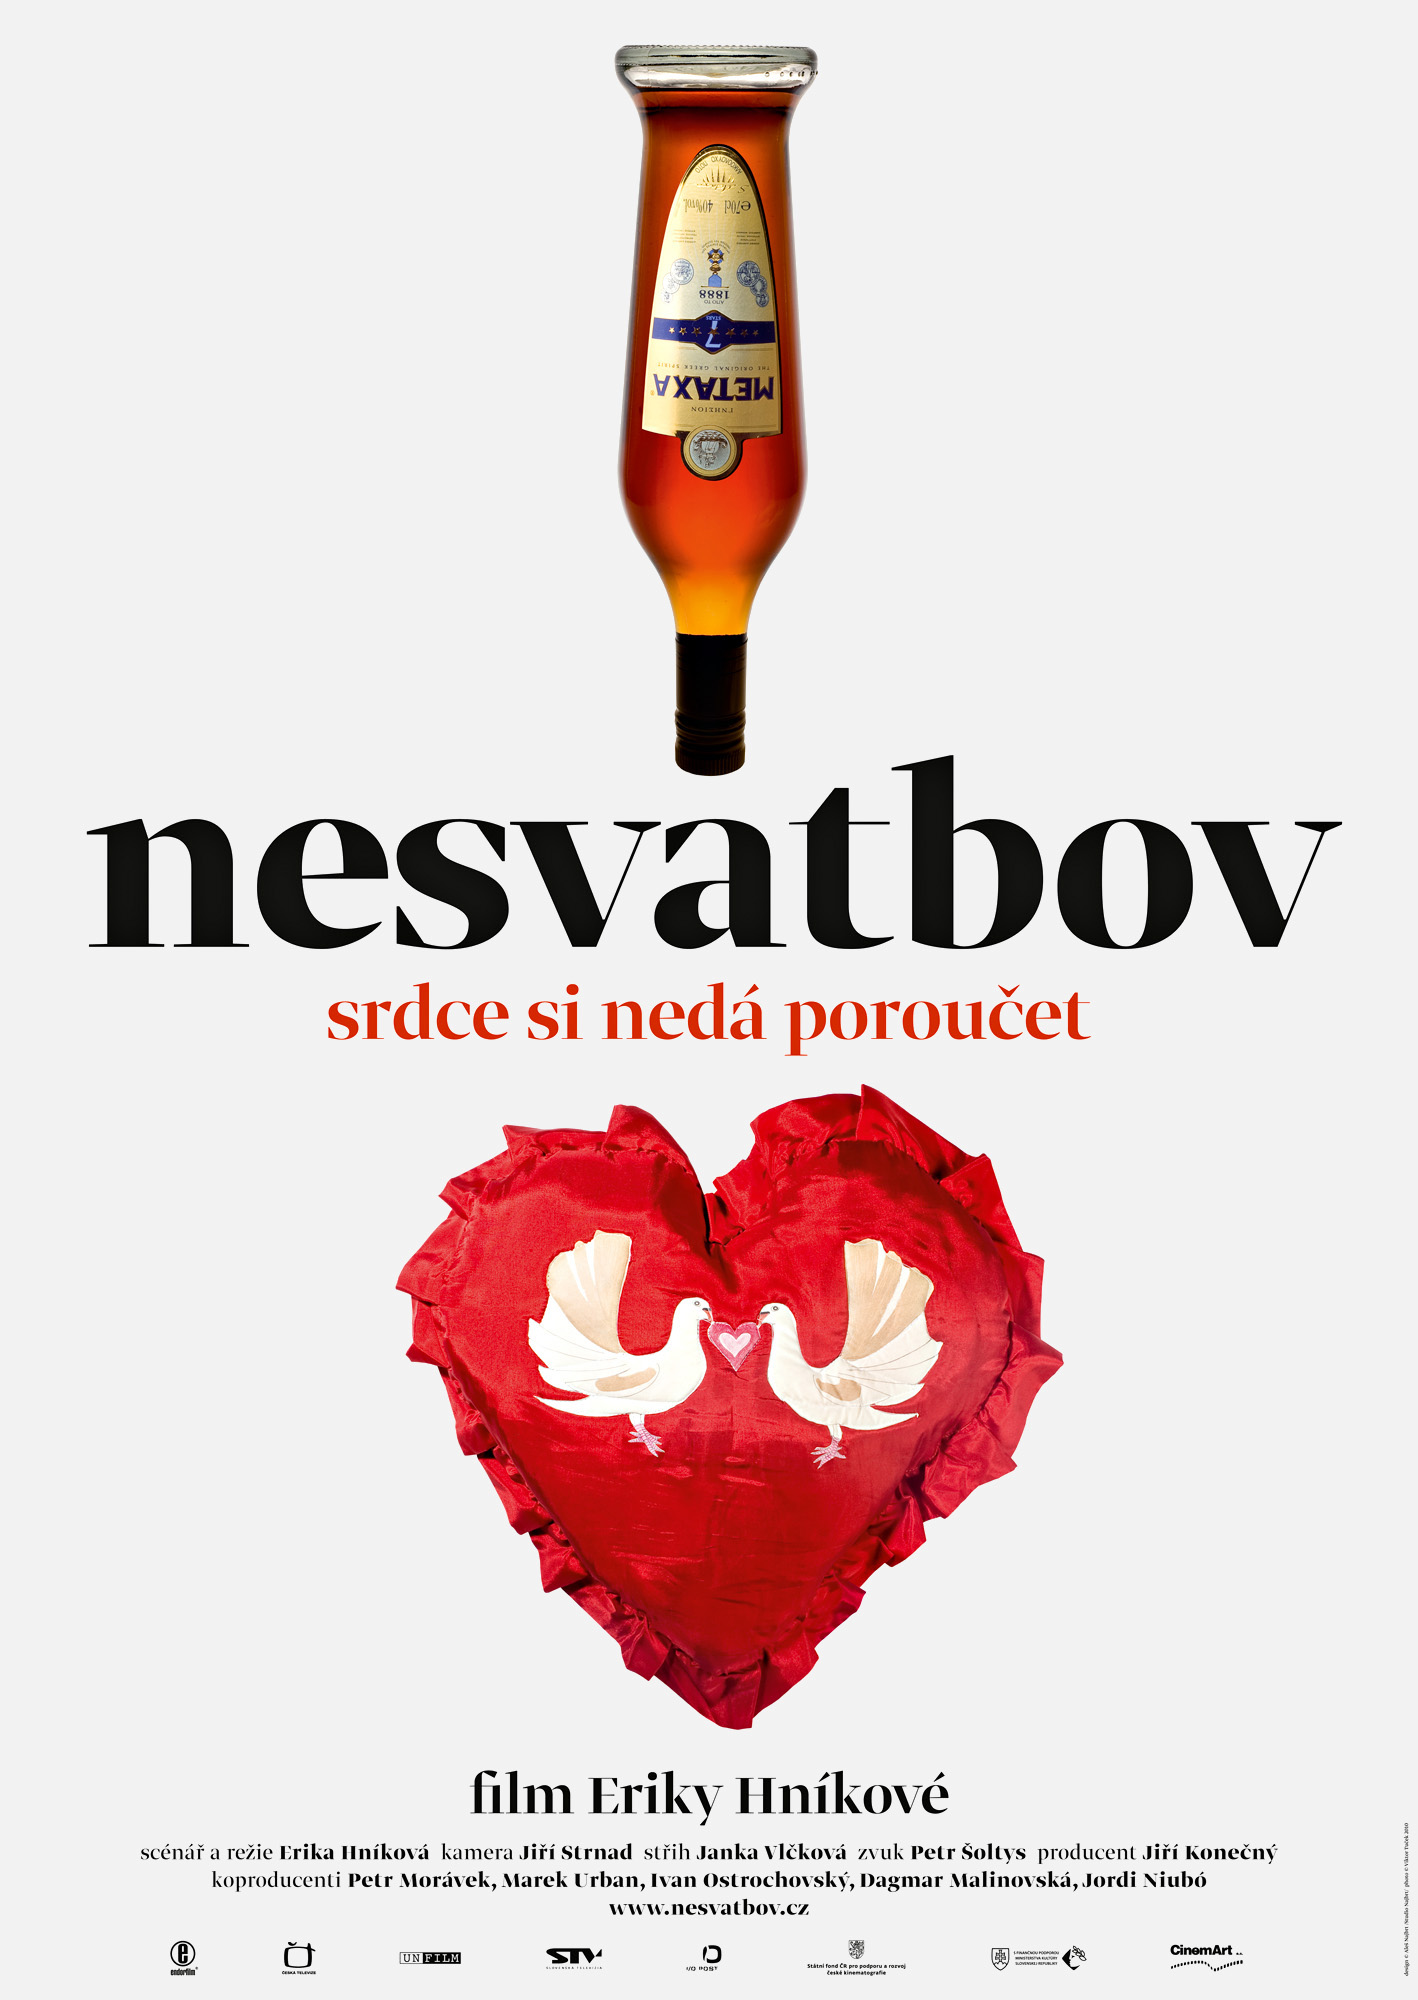 Nesvatbov (Matchmaking Mayor)